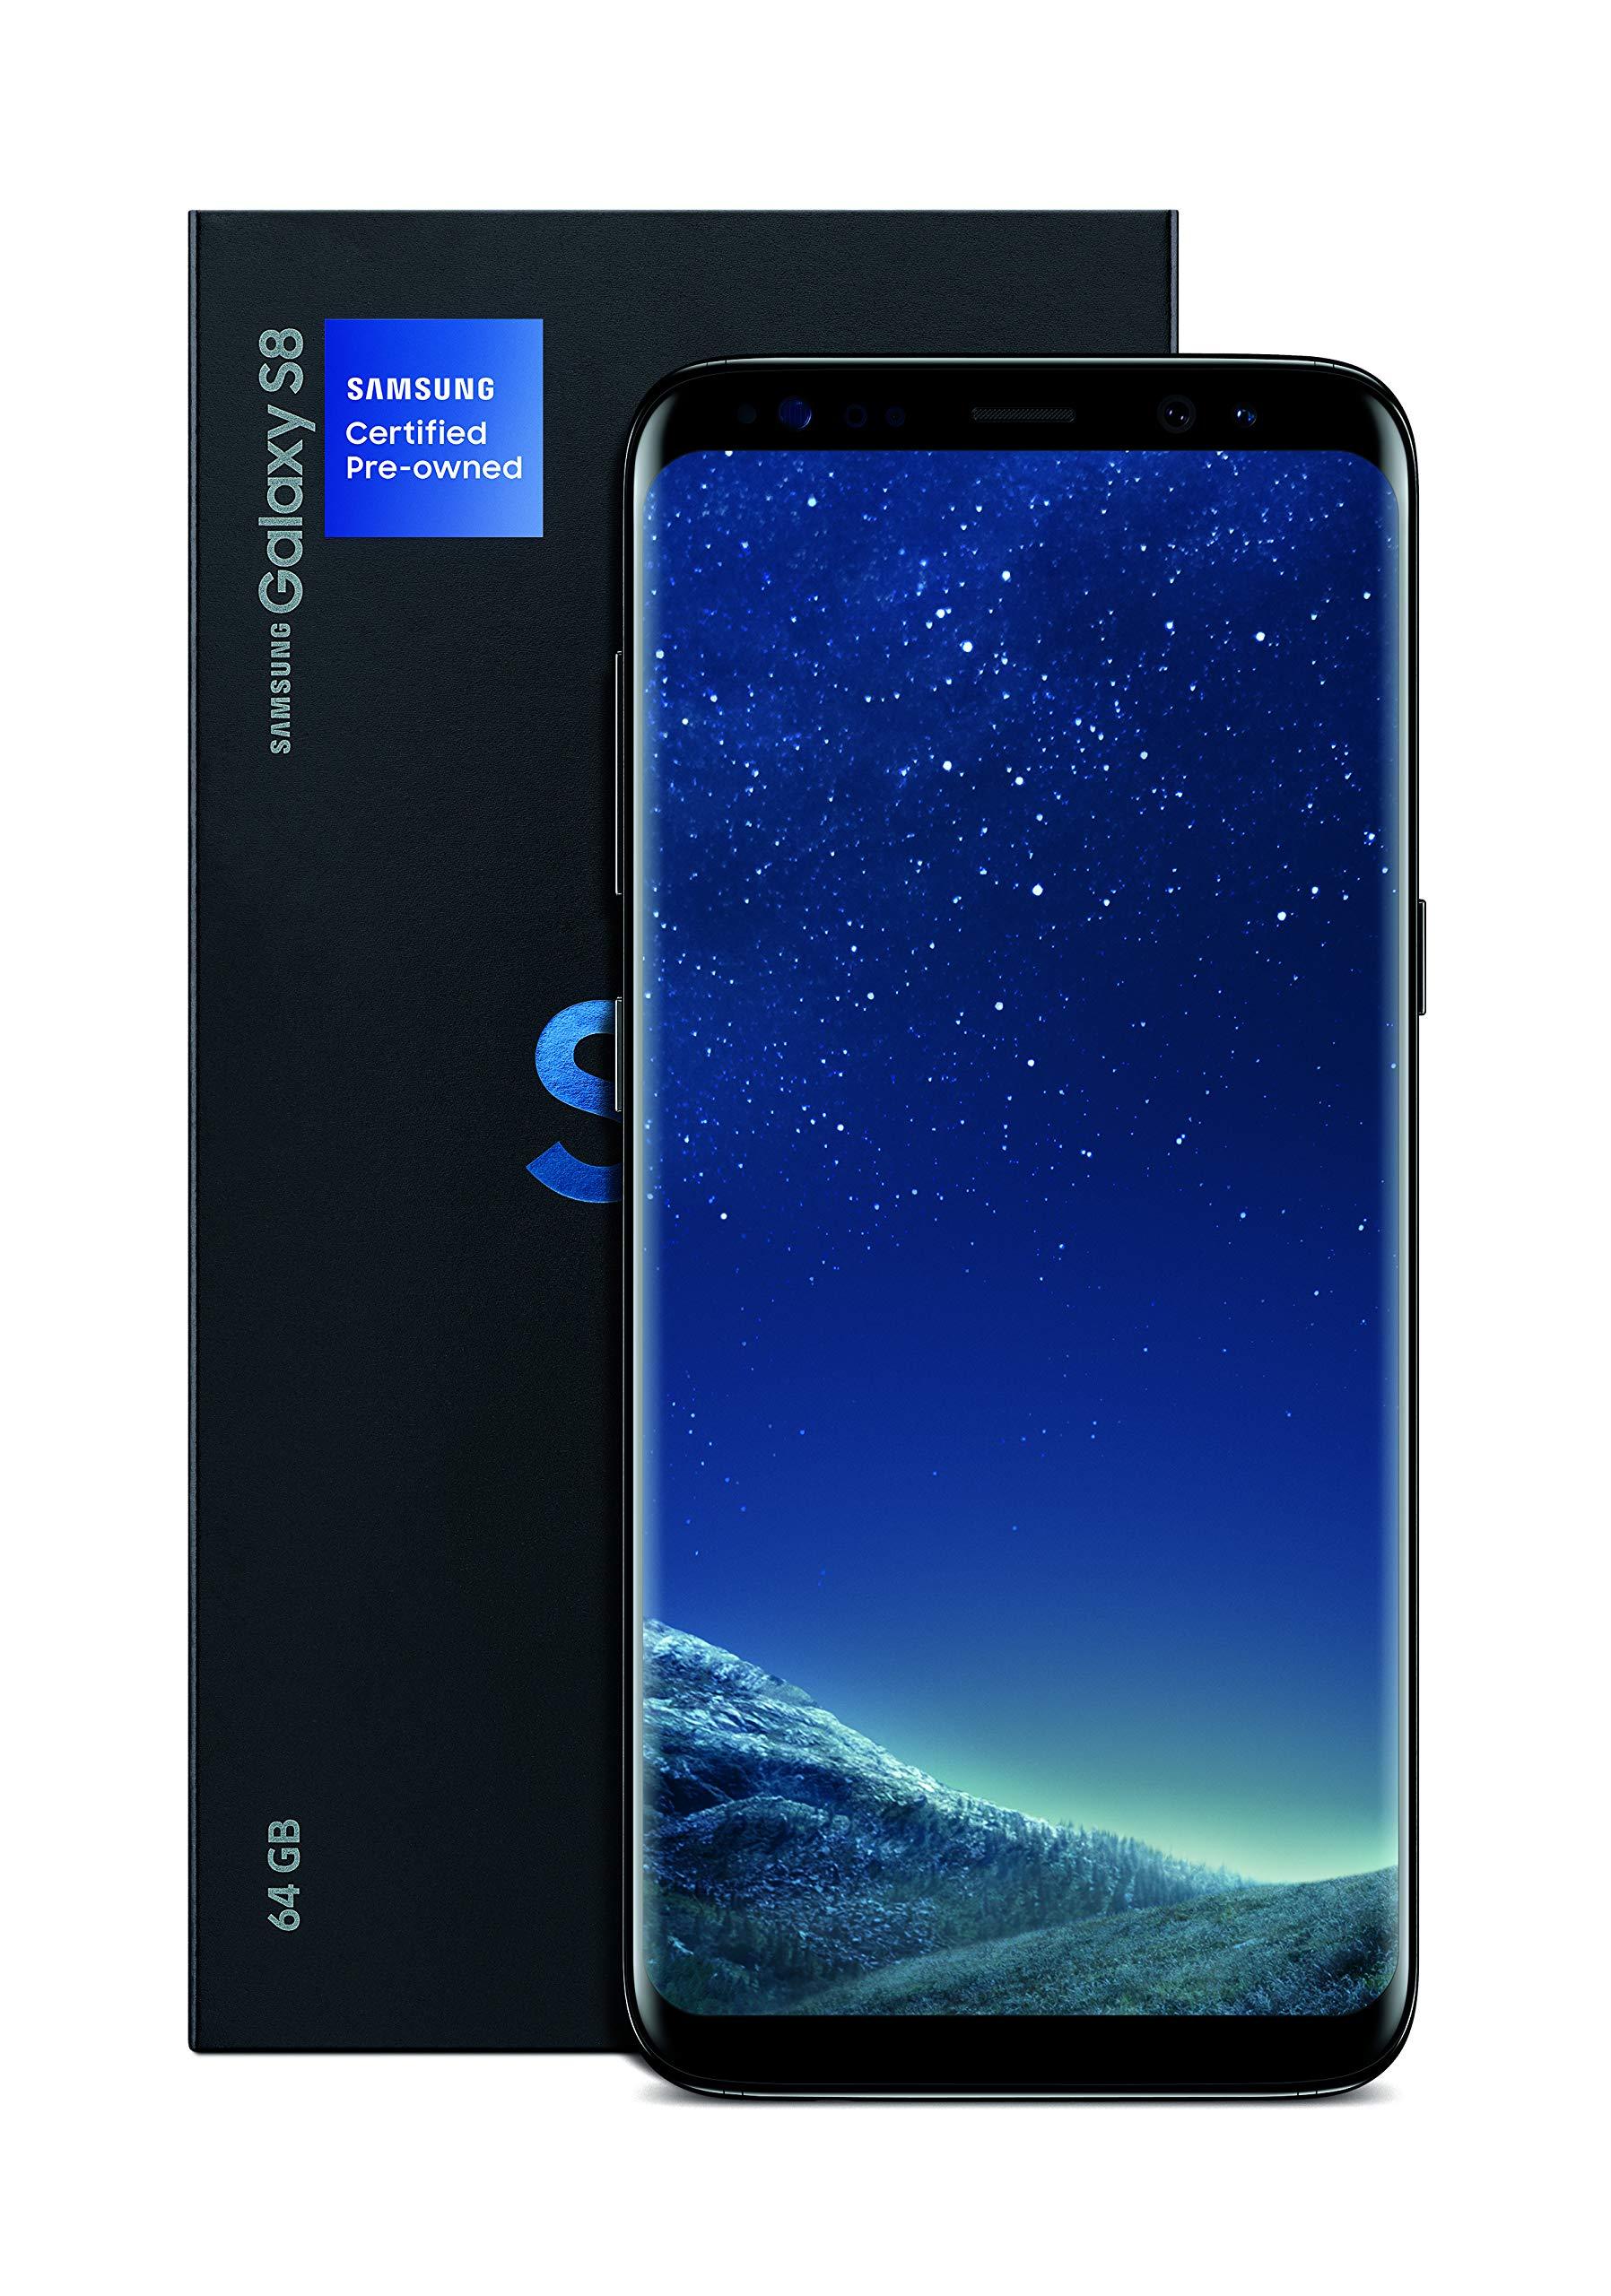 Samsung Galaxy S8 Certified Pre-Owned Factory Unlocked Phone – 5.8Inch Screen – 64GB – Midnight Black (U.S. Warranty)(Renewed)